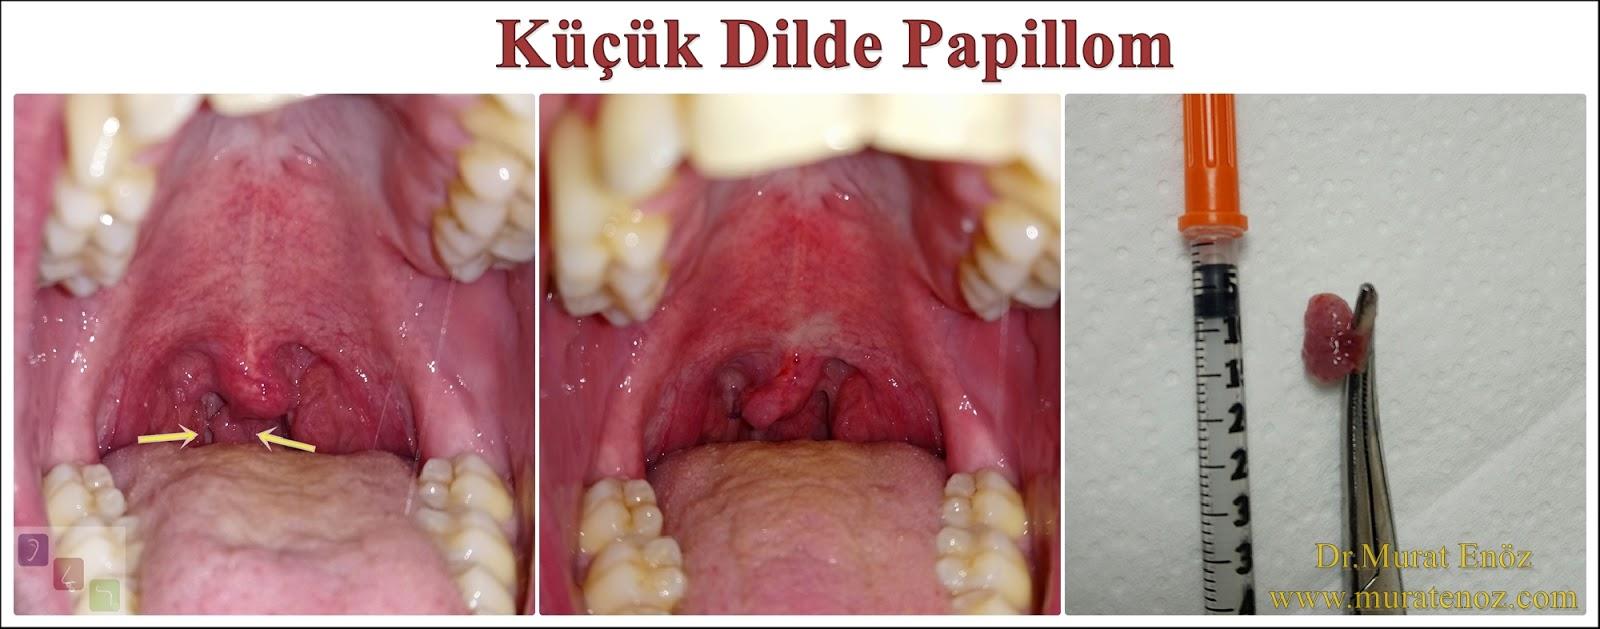 hpv swollen uvula